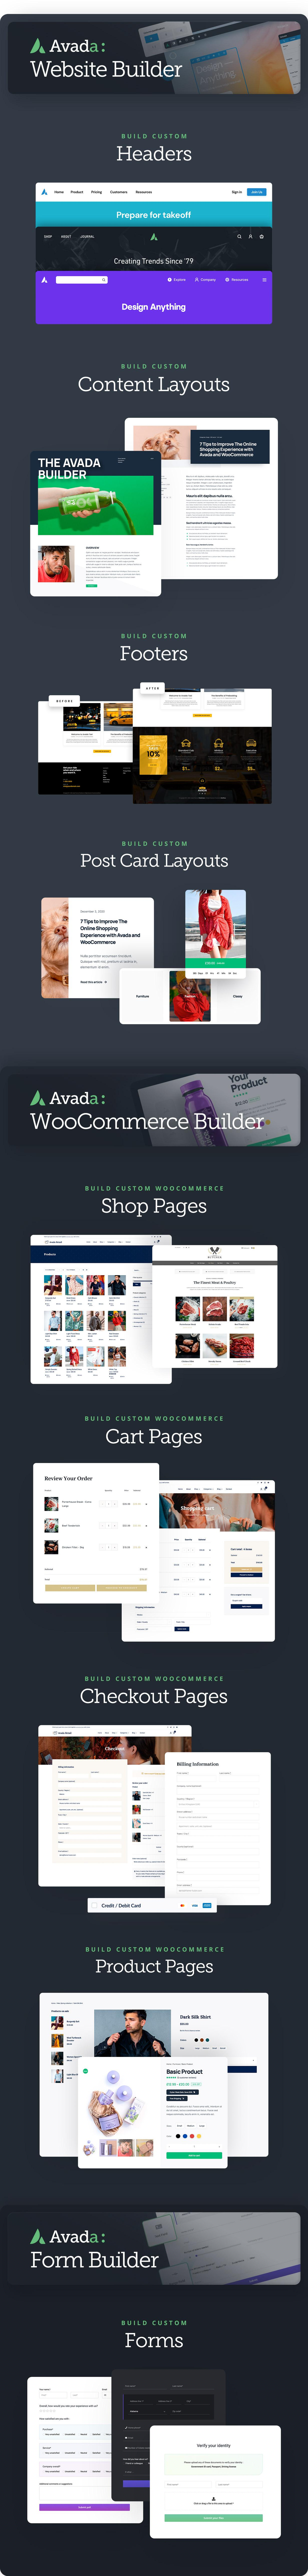 Avada | Website Builder For WordPress & WooCommerce - 6